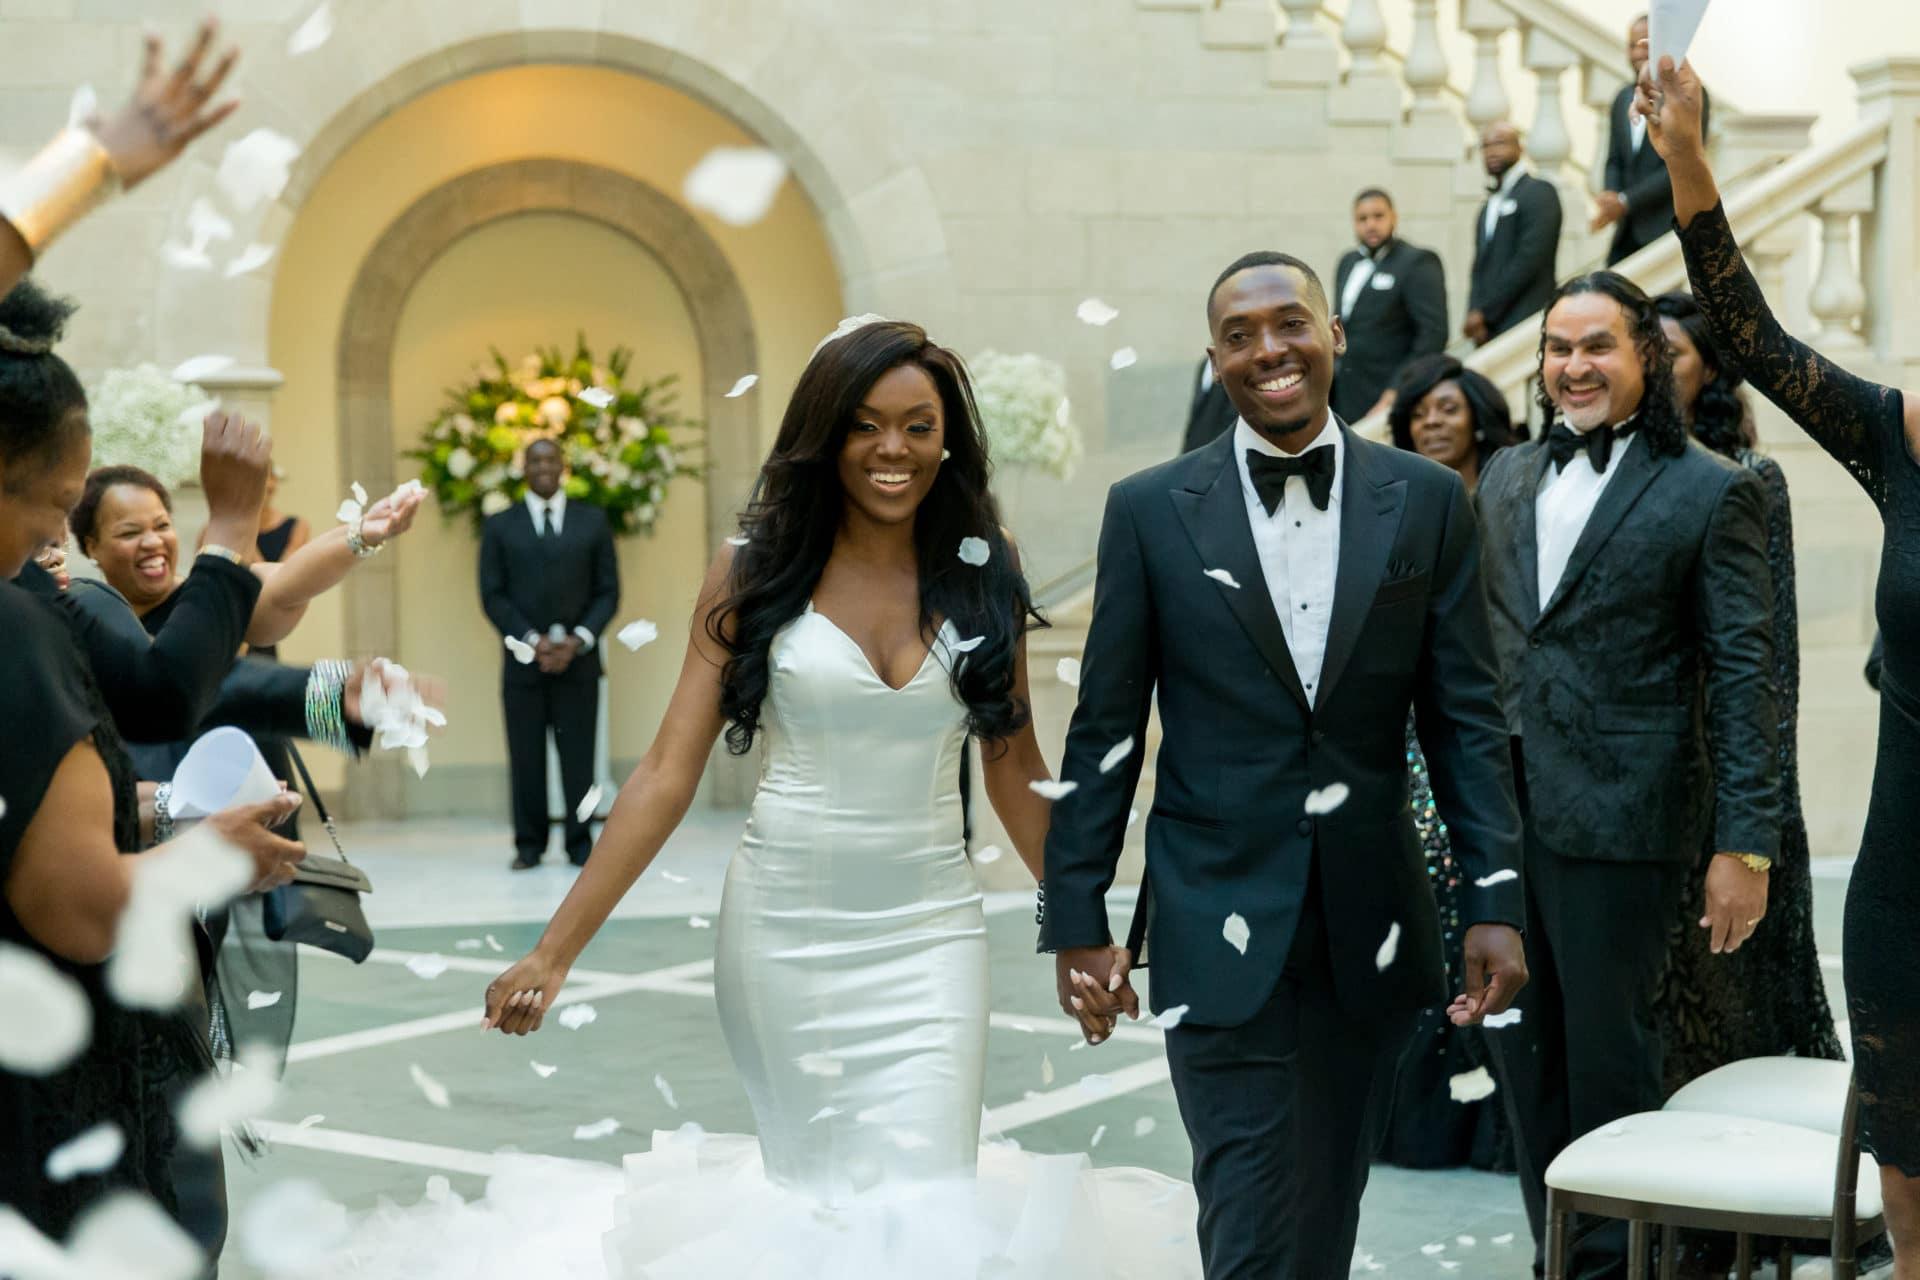 7ea0db6aea4a Bridal Bliss  Sydnisha and Johnathan s Black-Tie Wedding Was A Work Of Art  - Essence